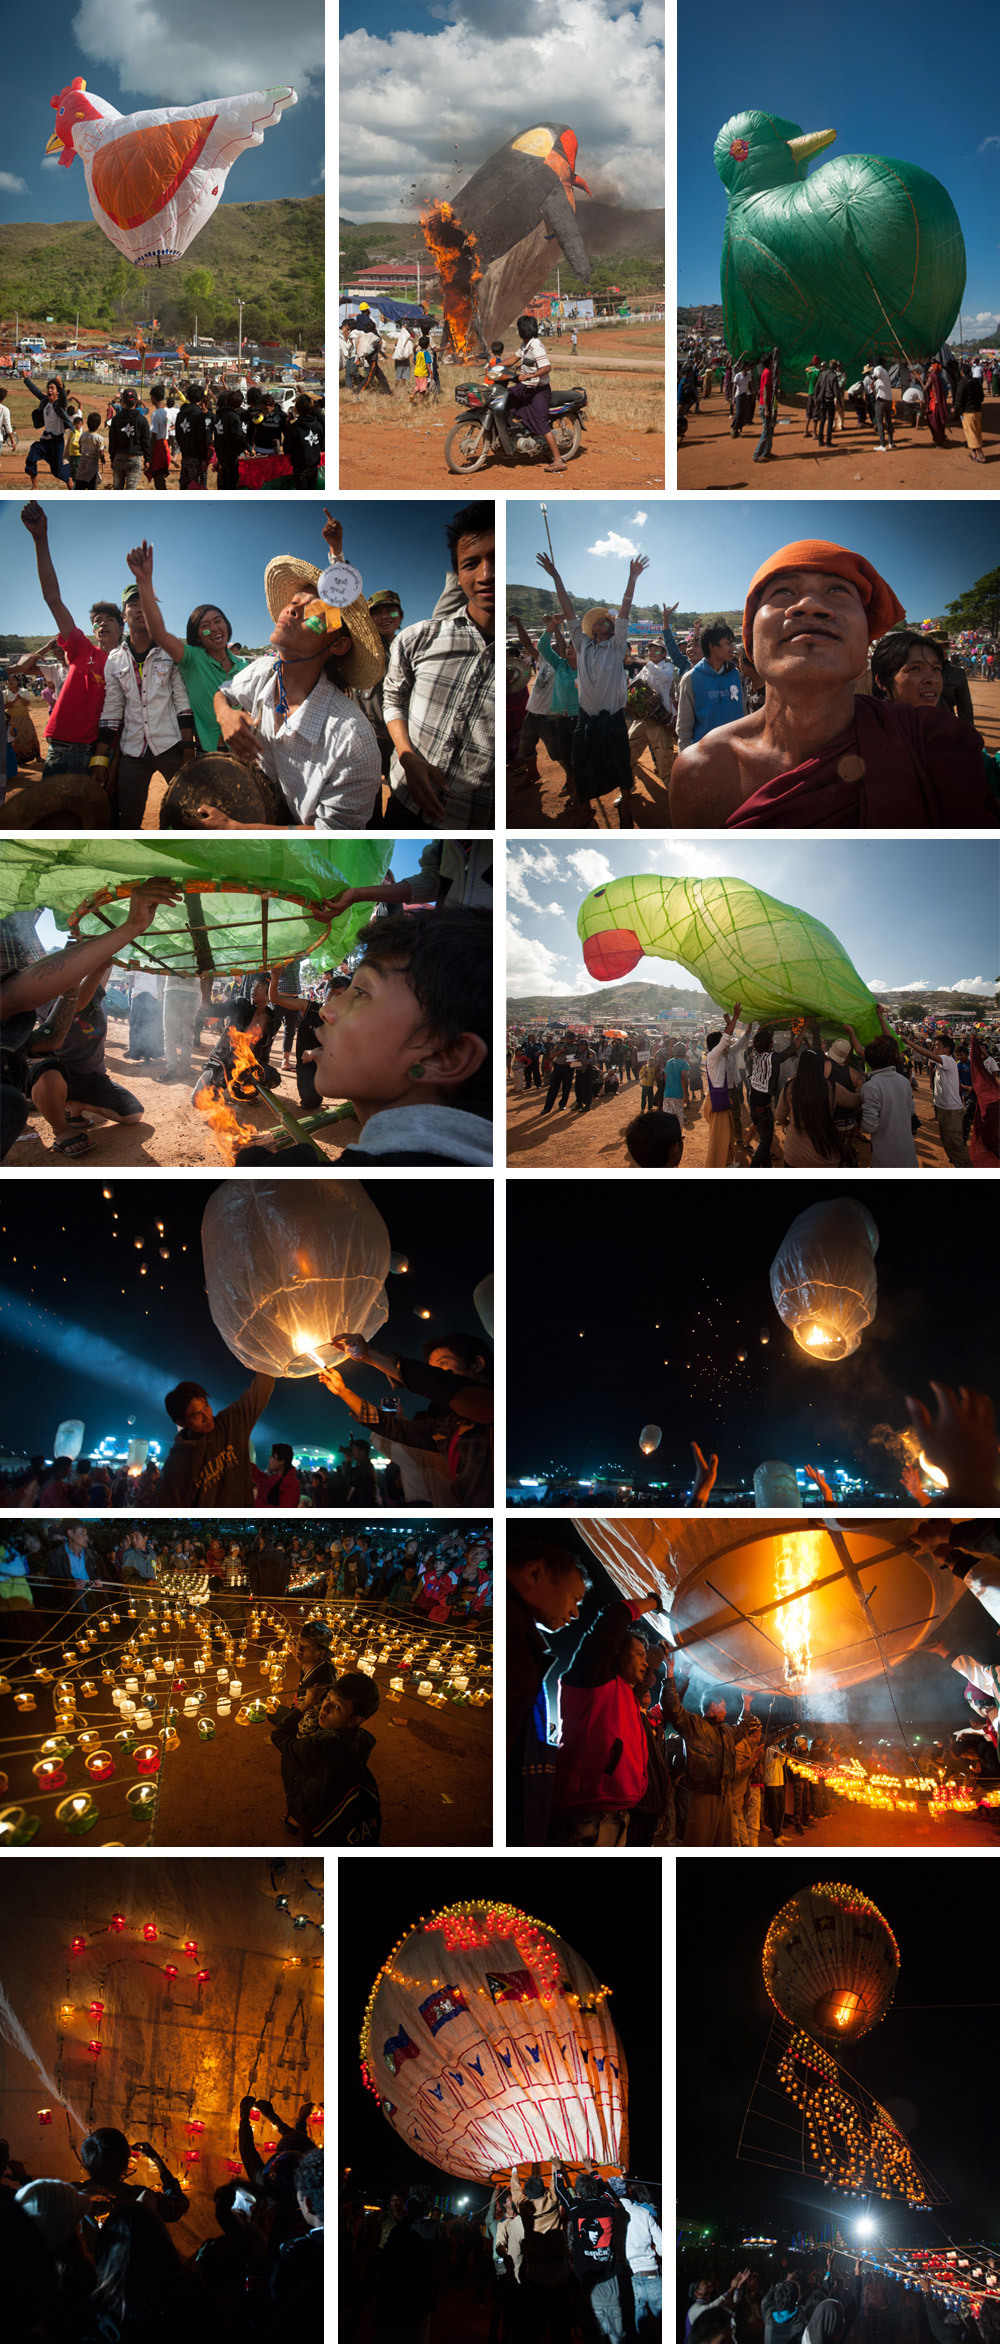 Balloon_fest.jpg